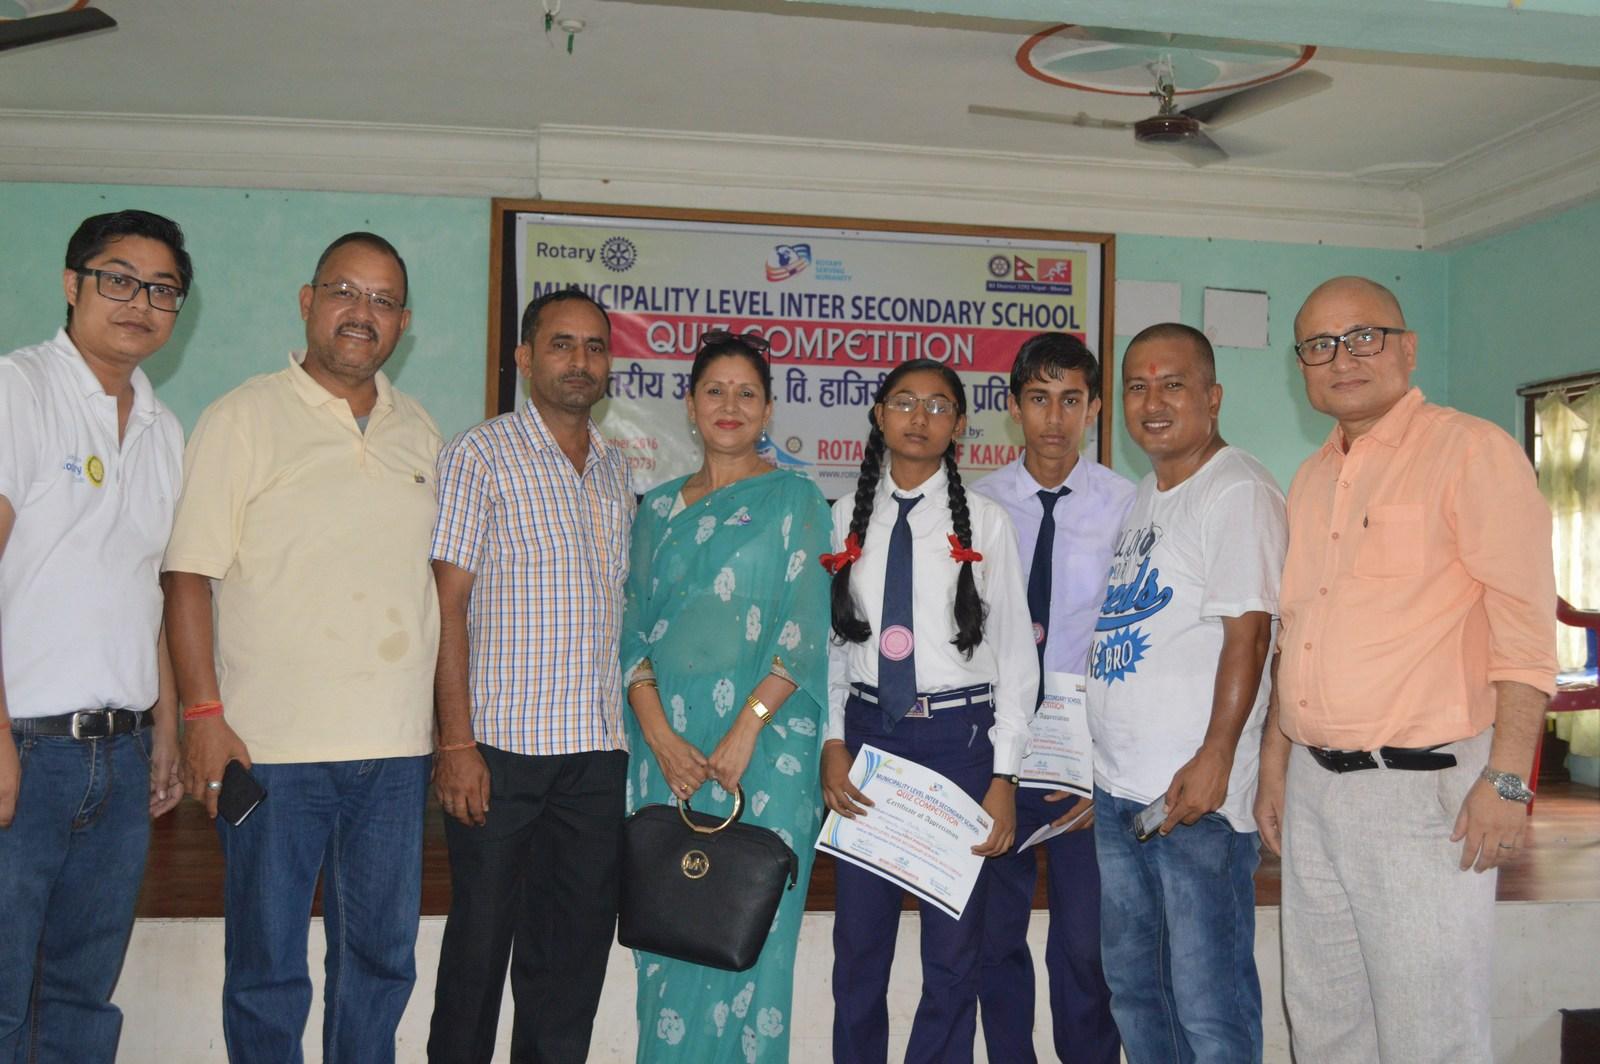 Municipality-Level-Inter-Secondary-School-Quiz-Contest-2016-Rotary-Club-of-Kakarvitta-72